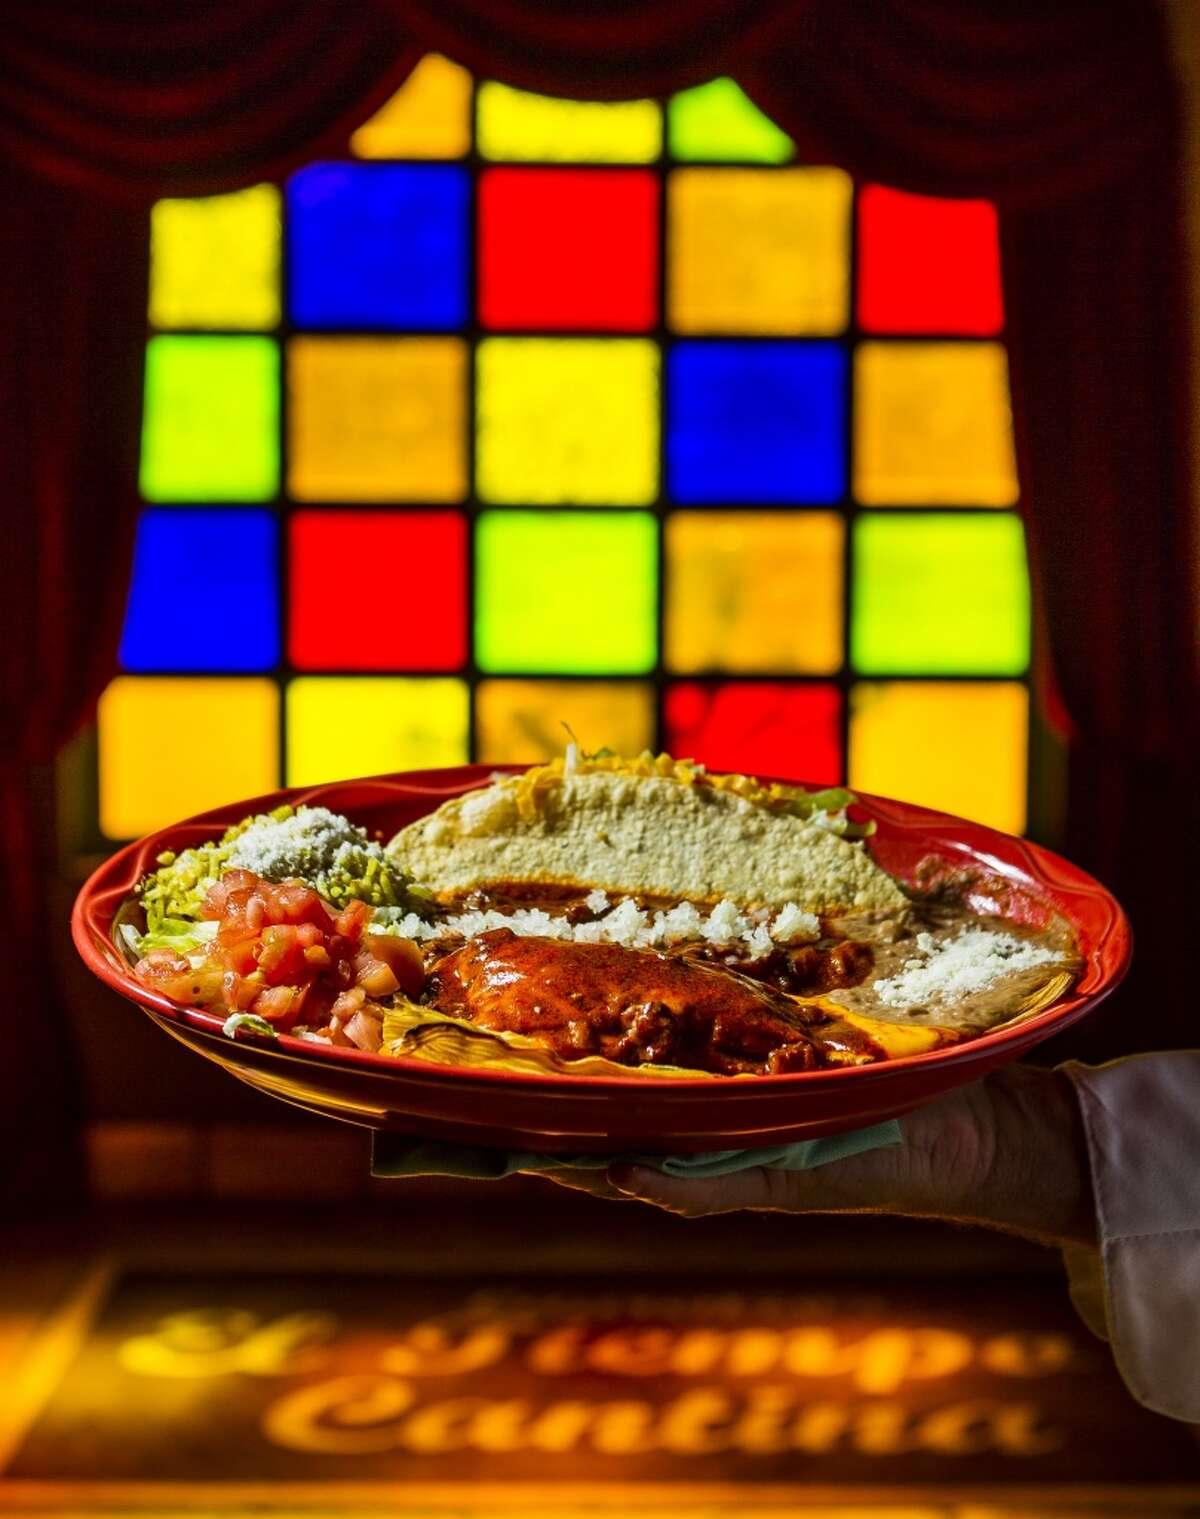 El Tiempo Cantina's flauta, tamale and taco plate.